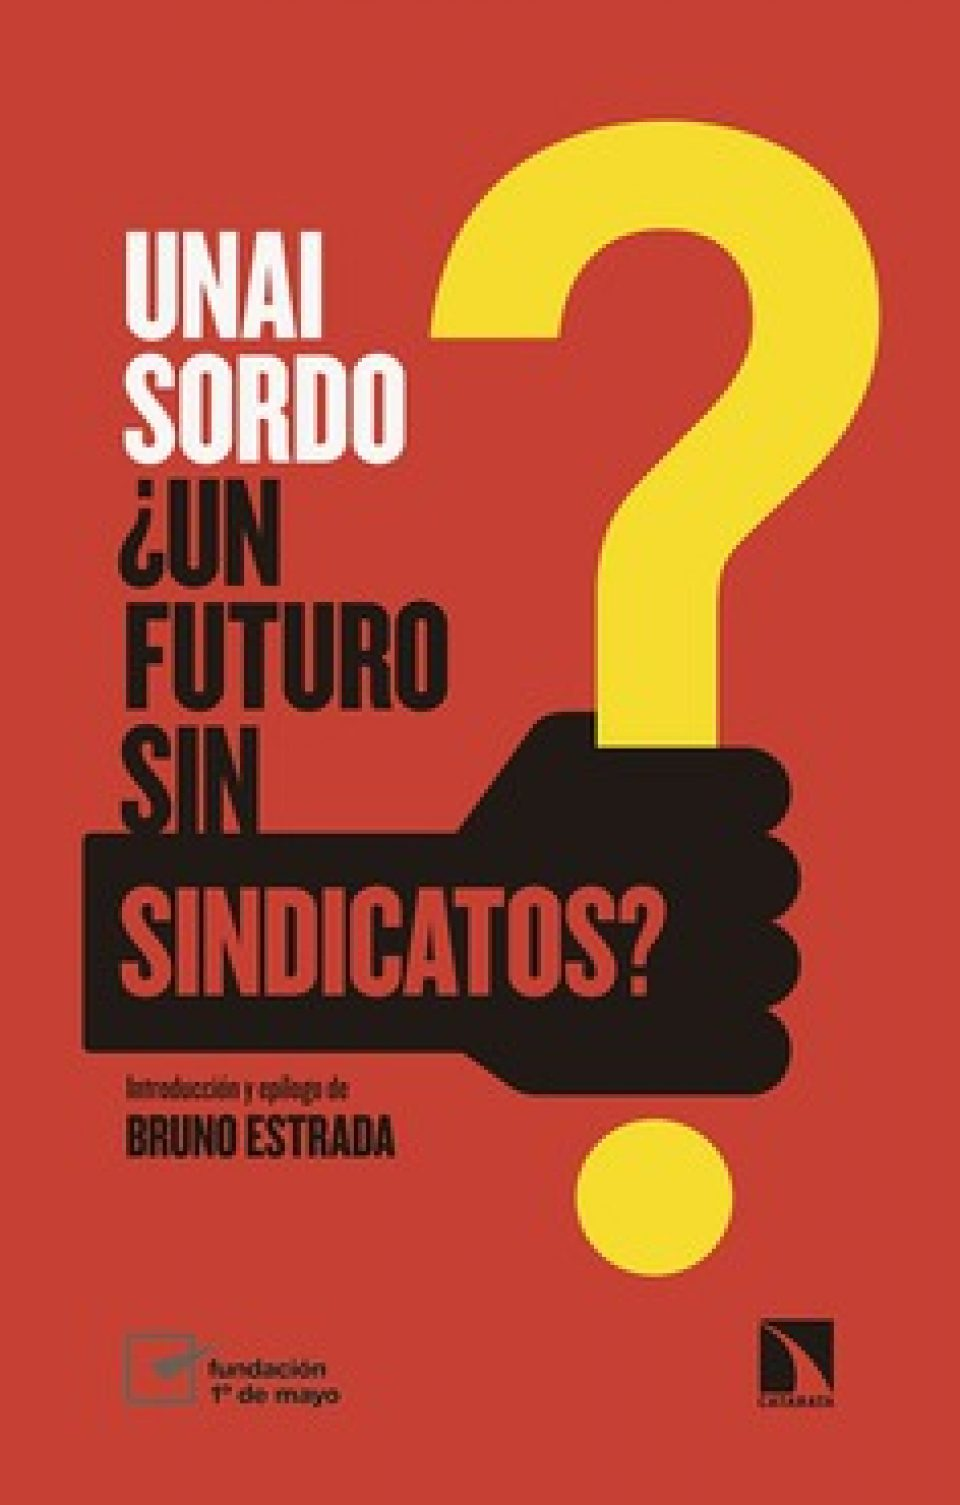 https://unaisordo.com/wp-content/uploads/2019/07/futuro-sin-960x1505_c.jpg